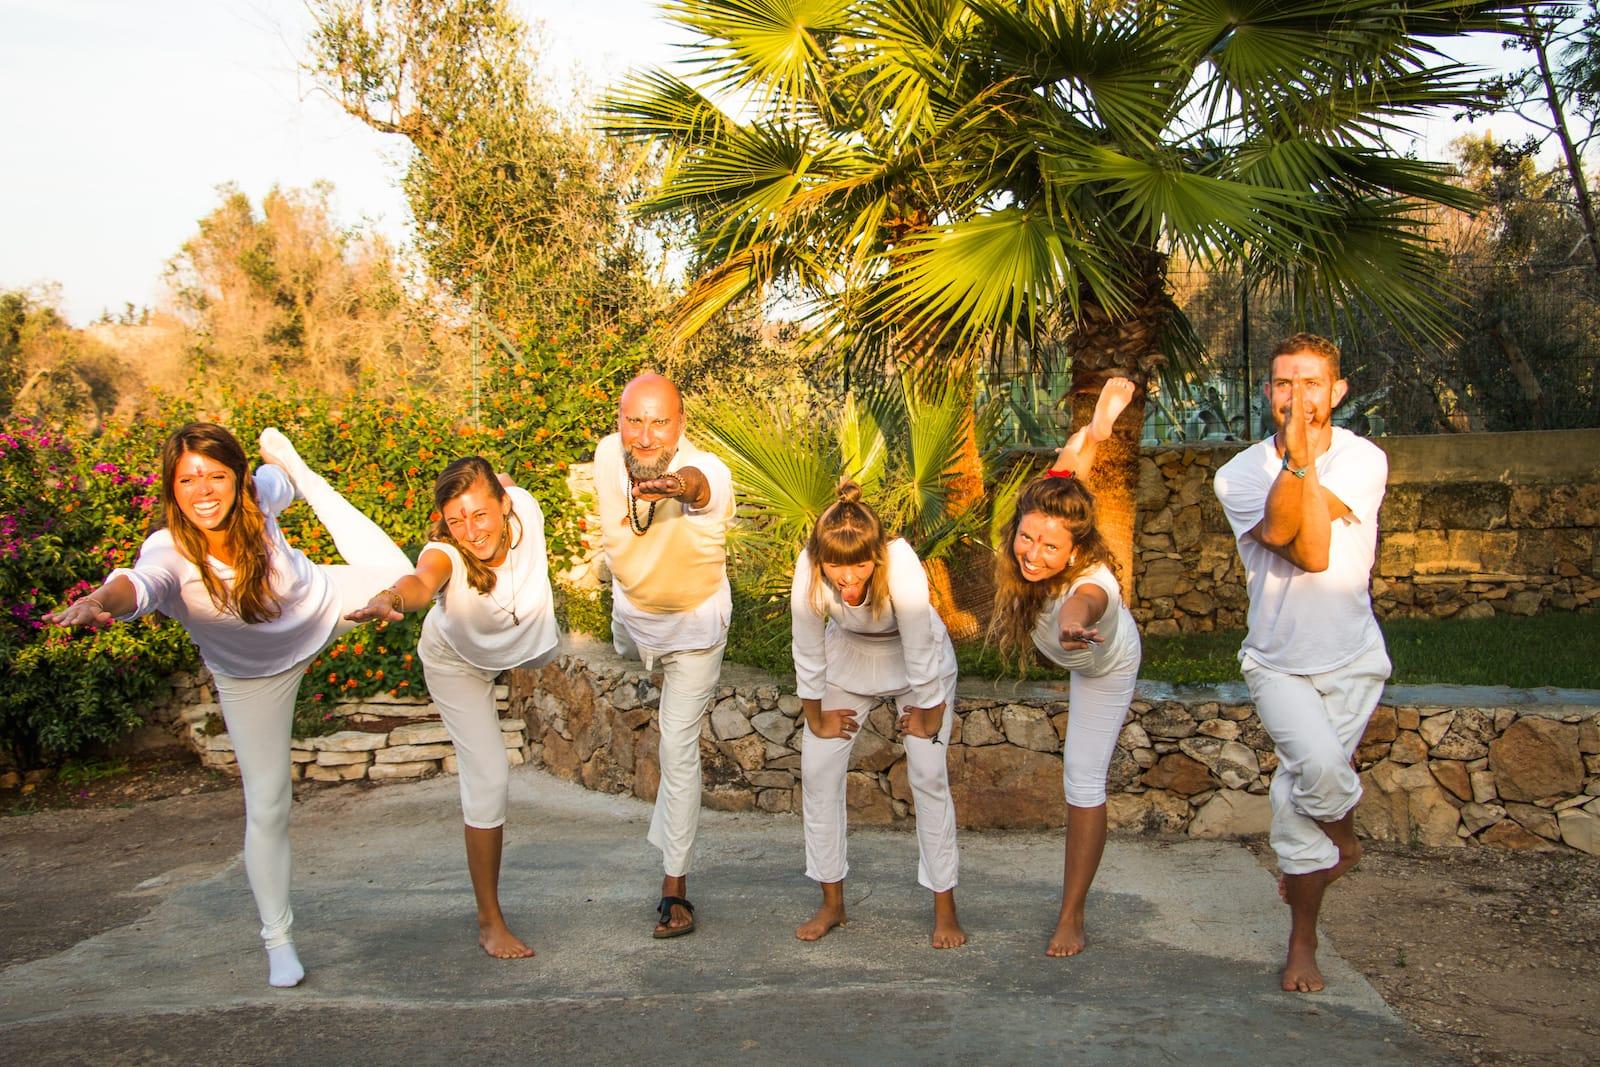 Yoga teacher training students doing various yoga asanas in a garden